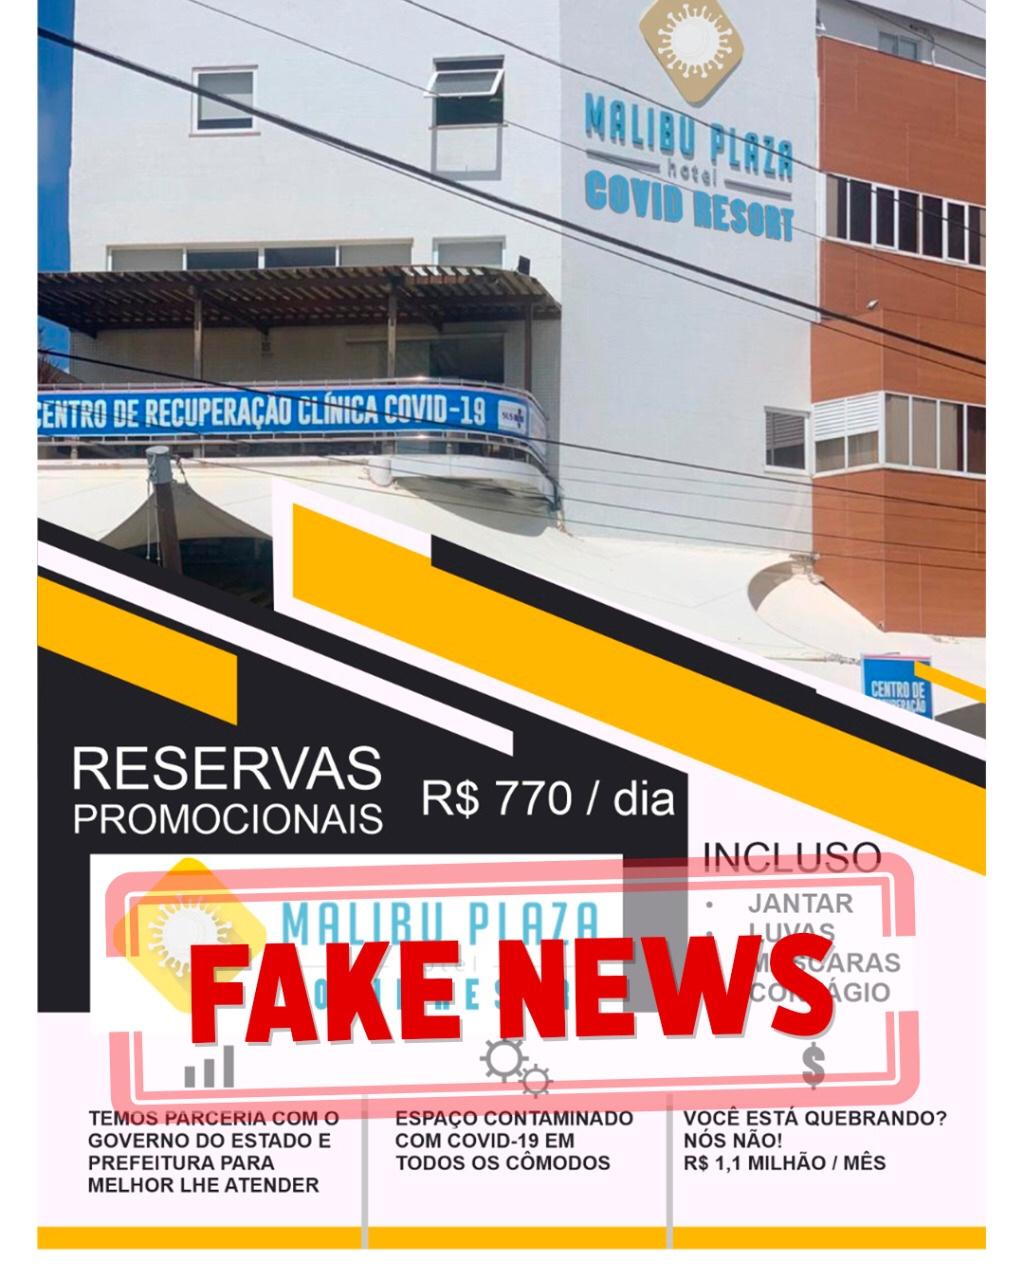 Fake News tenta envolver Prefeitura no caso Malibu